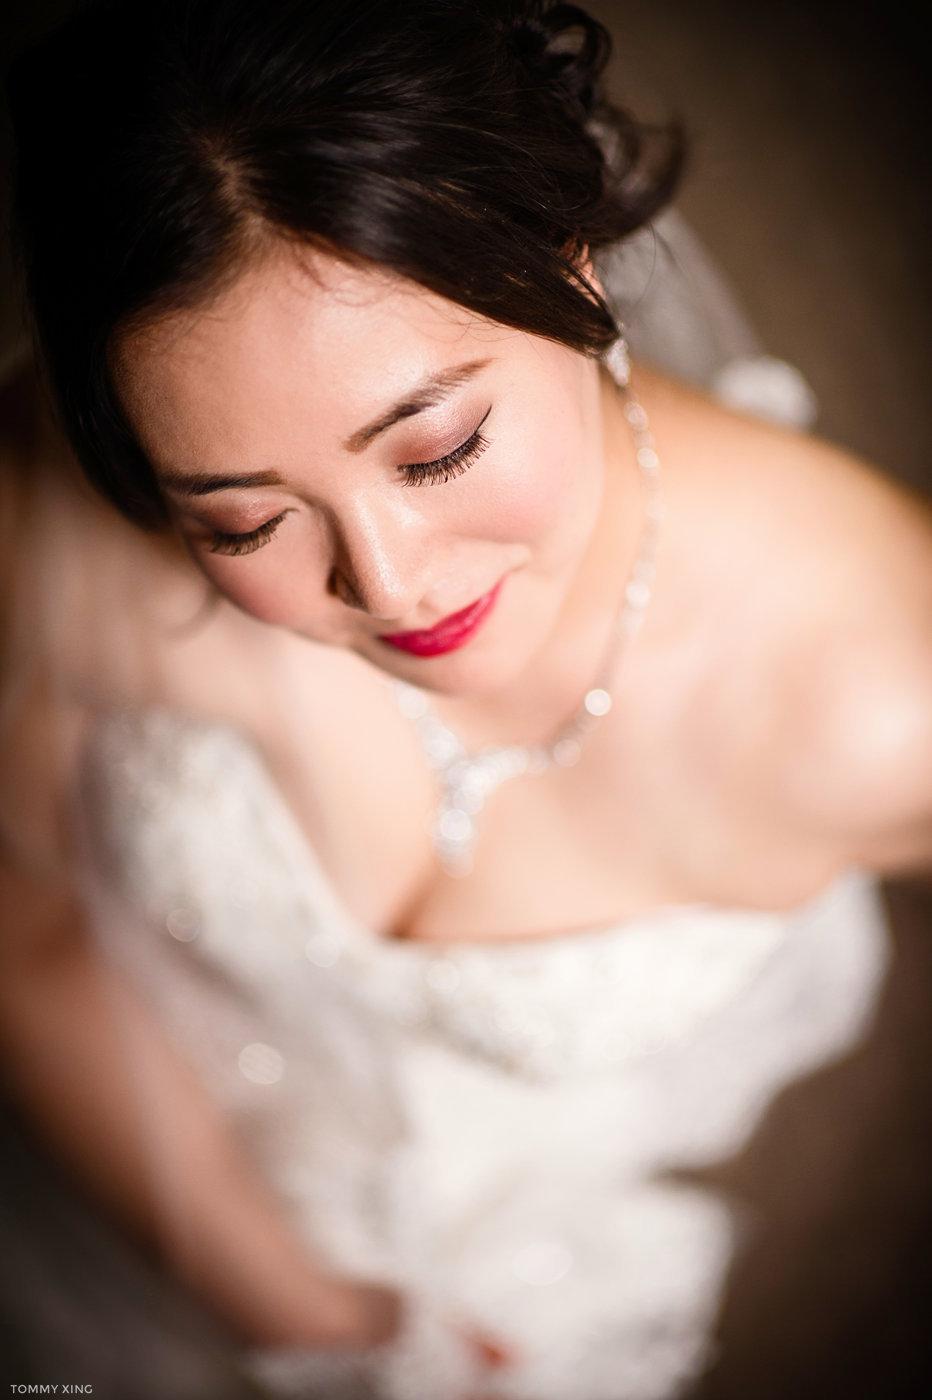 STANFORD MEMORIAL CHURCH WEDDING - Wenjie & Chengcheng - SAN FRANCISCO BAY AREA 斯坦福教堂婚礼跟拍 - 洛杉矶婚礼婚纱照摄影师 Tommy Xing Photography044.jpg